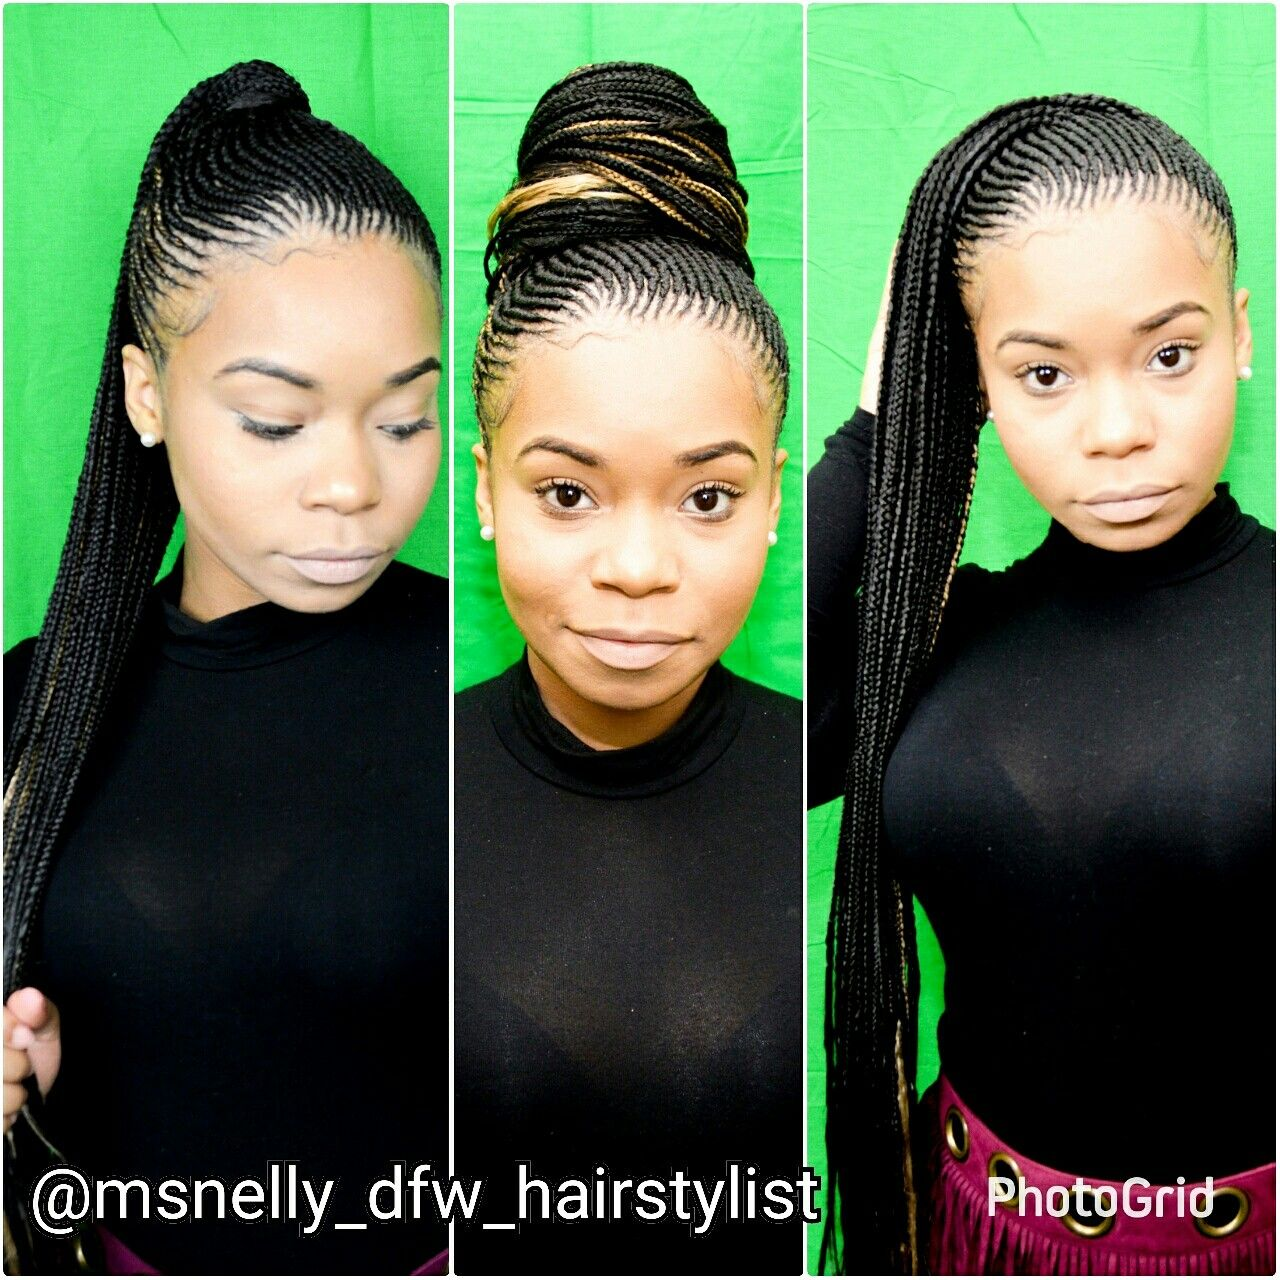 Braided Hairstyles for Little Girls hairstyleforblackwomen.net 68